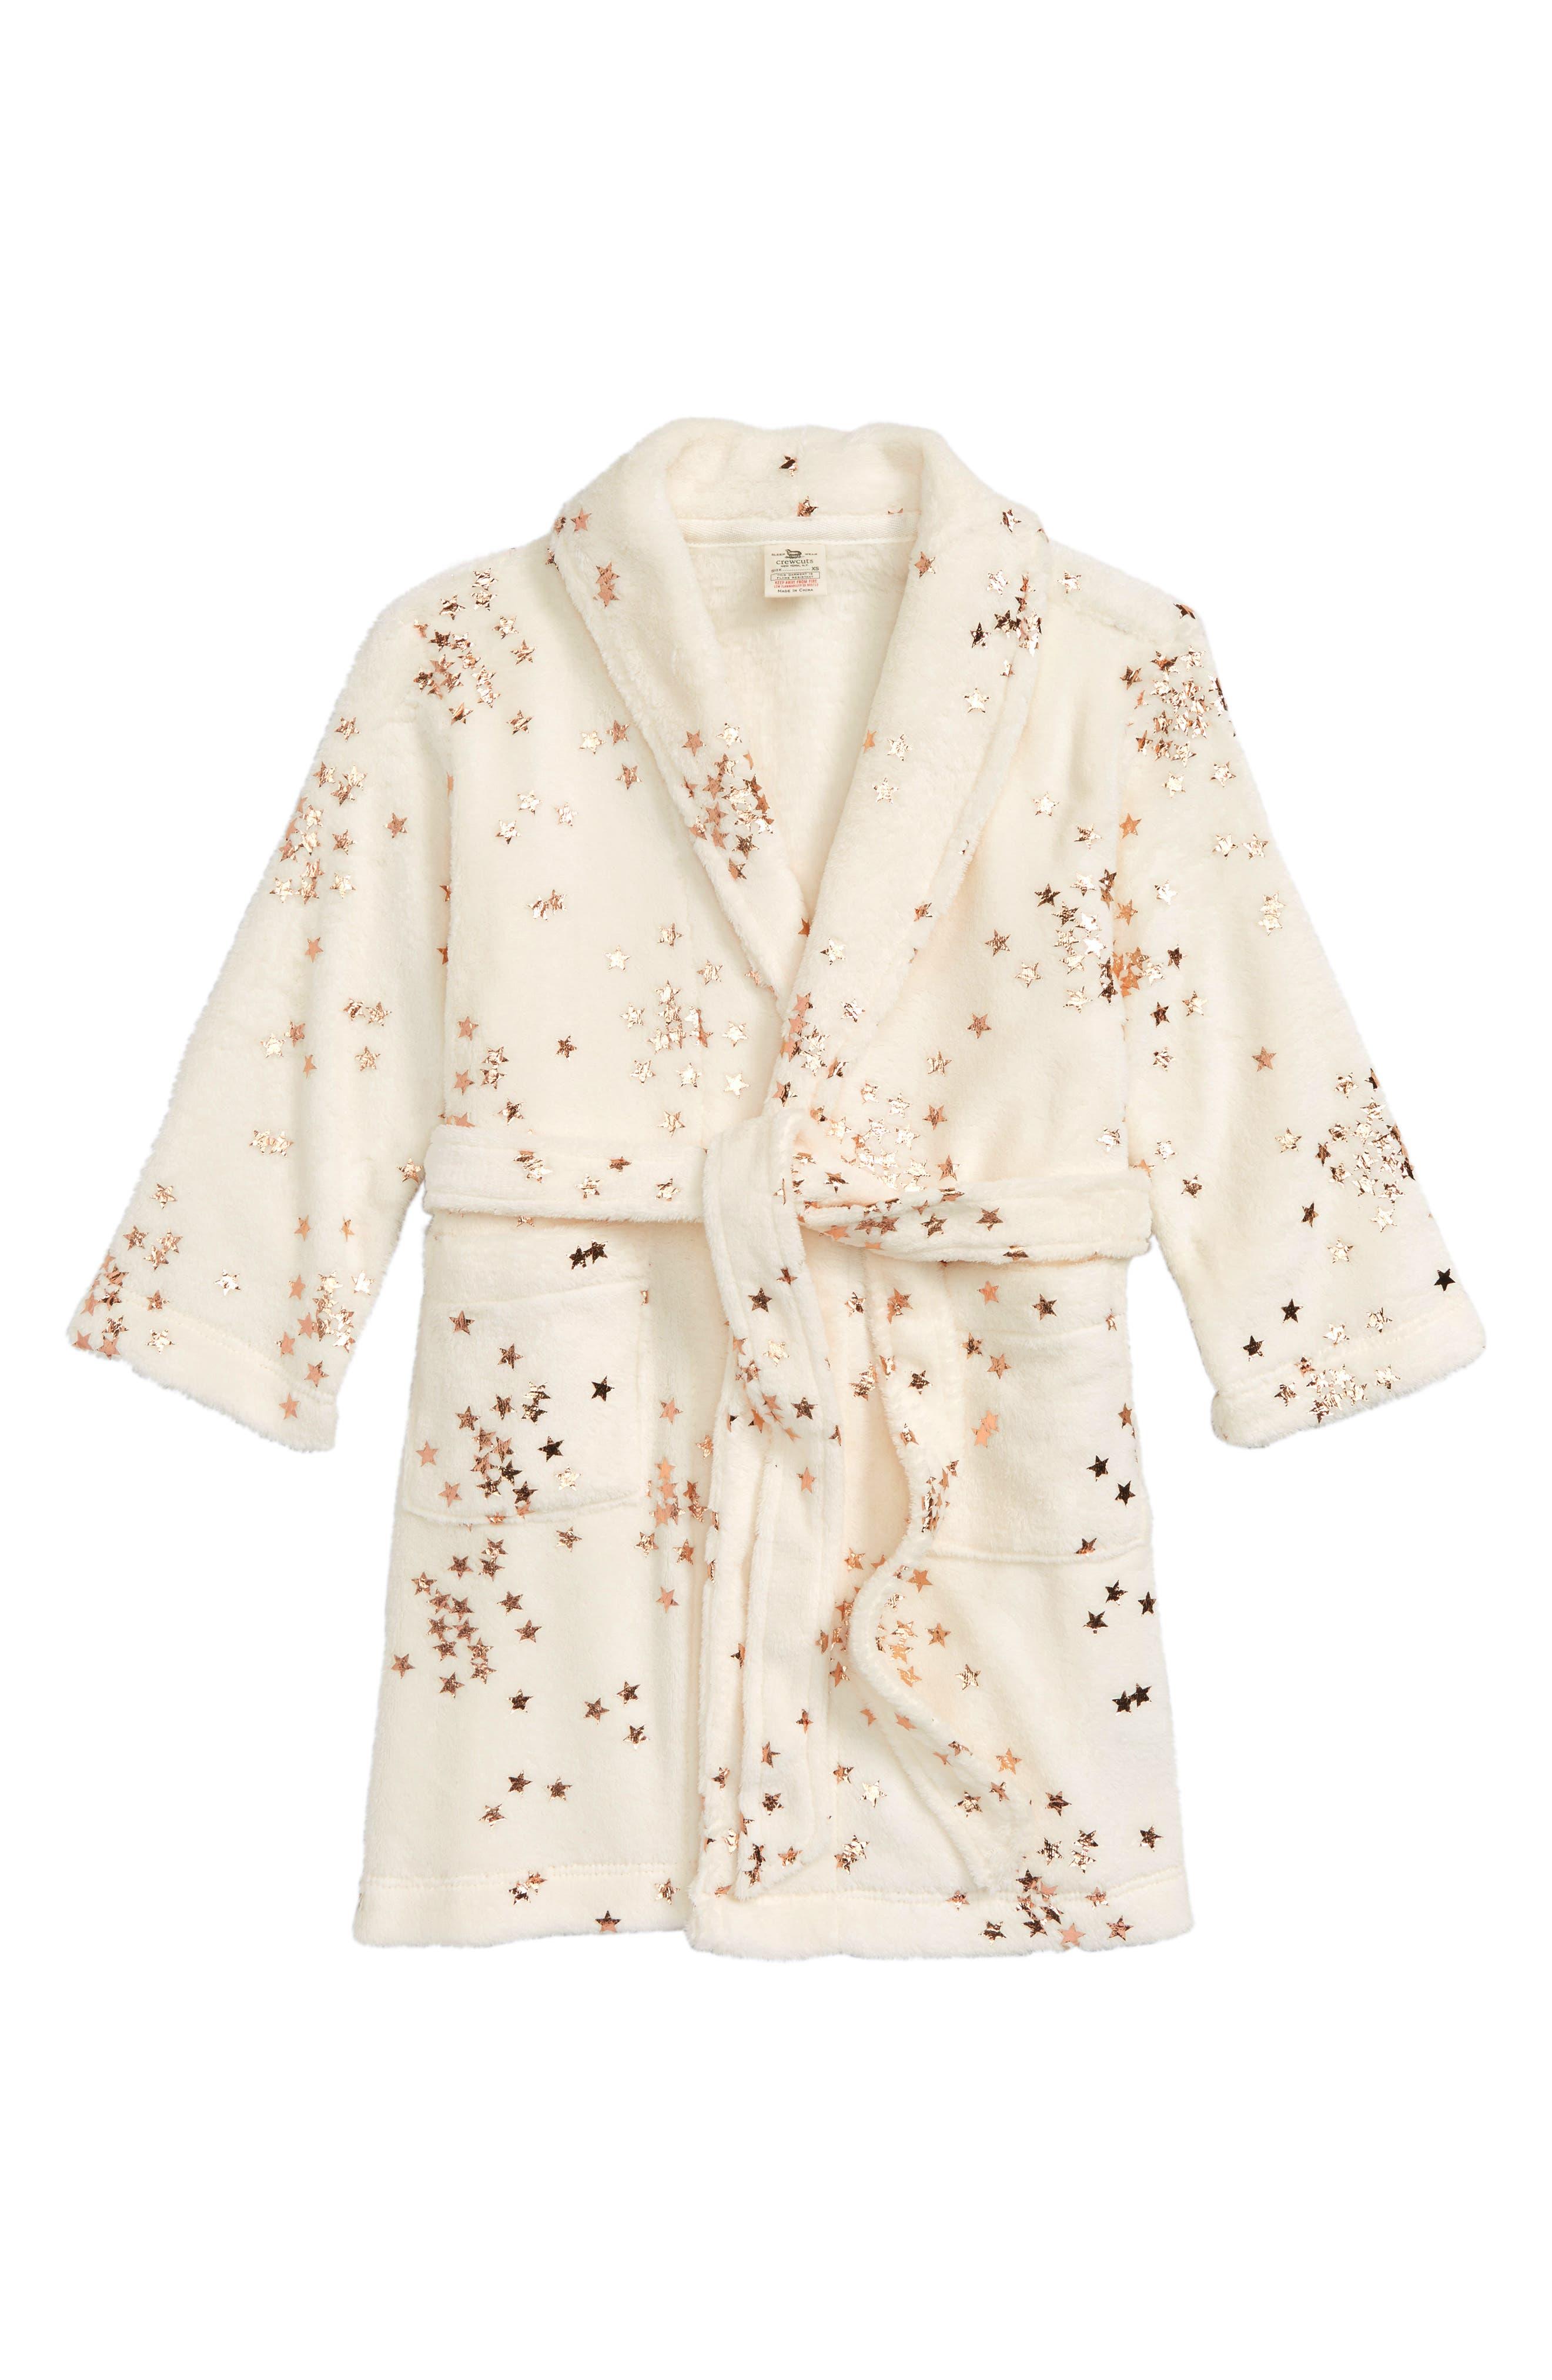 Star Fleece Robe,                         Main,                         color, IVORY ROSE GOLD